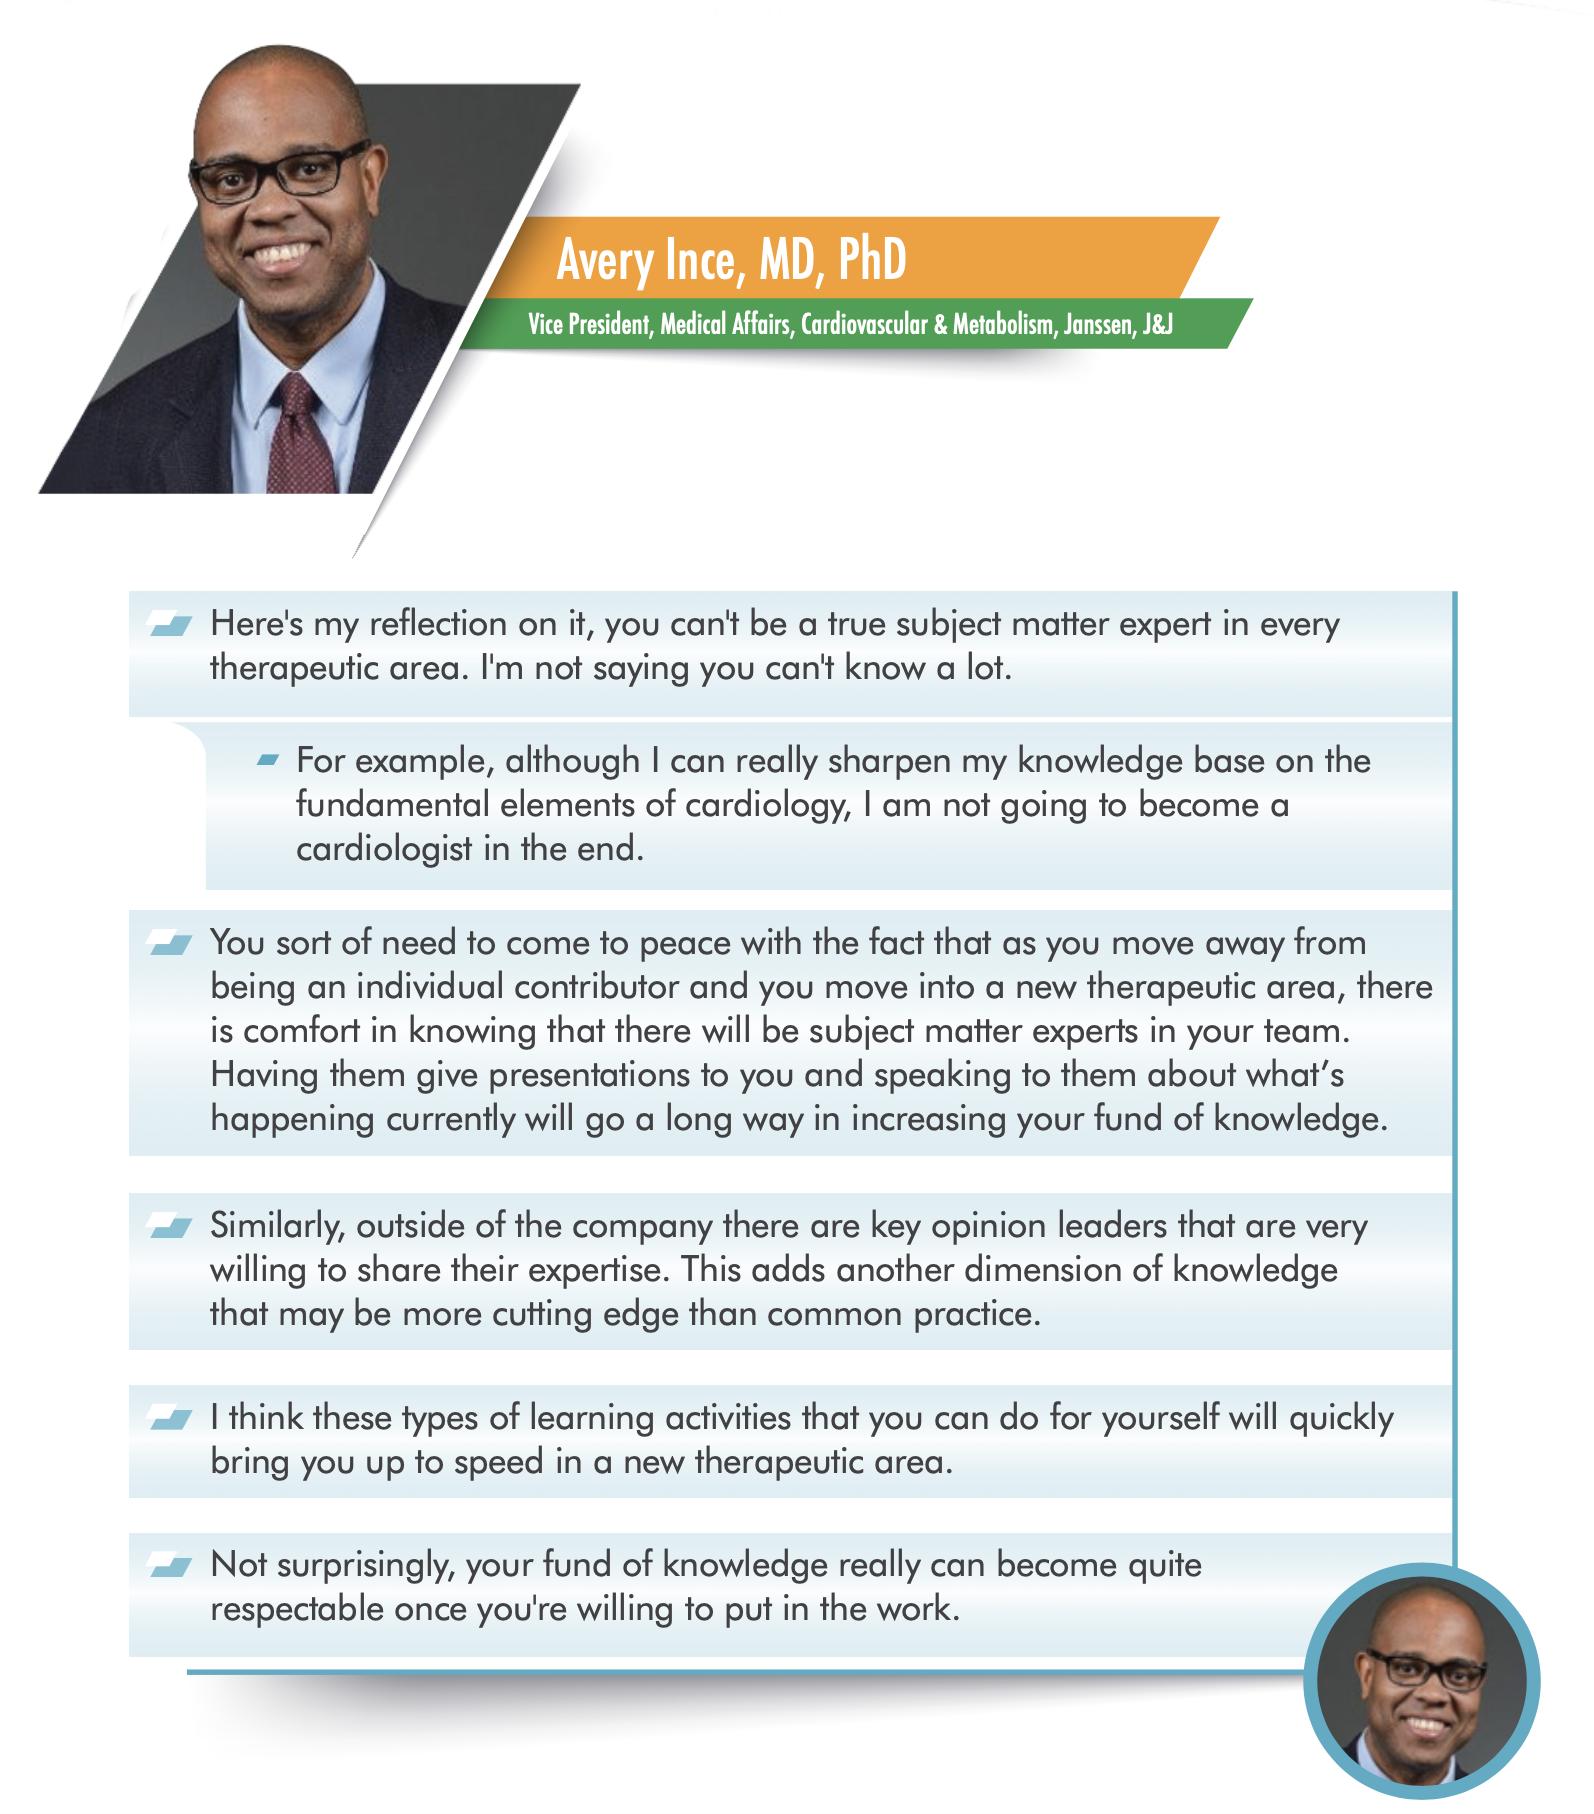 John Pracyk Leadership Perspectives 3.4